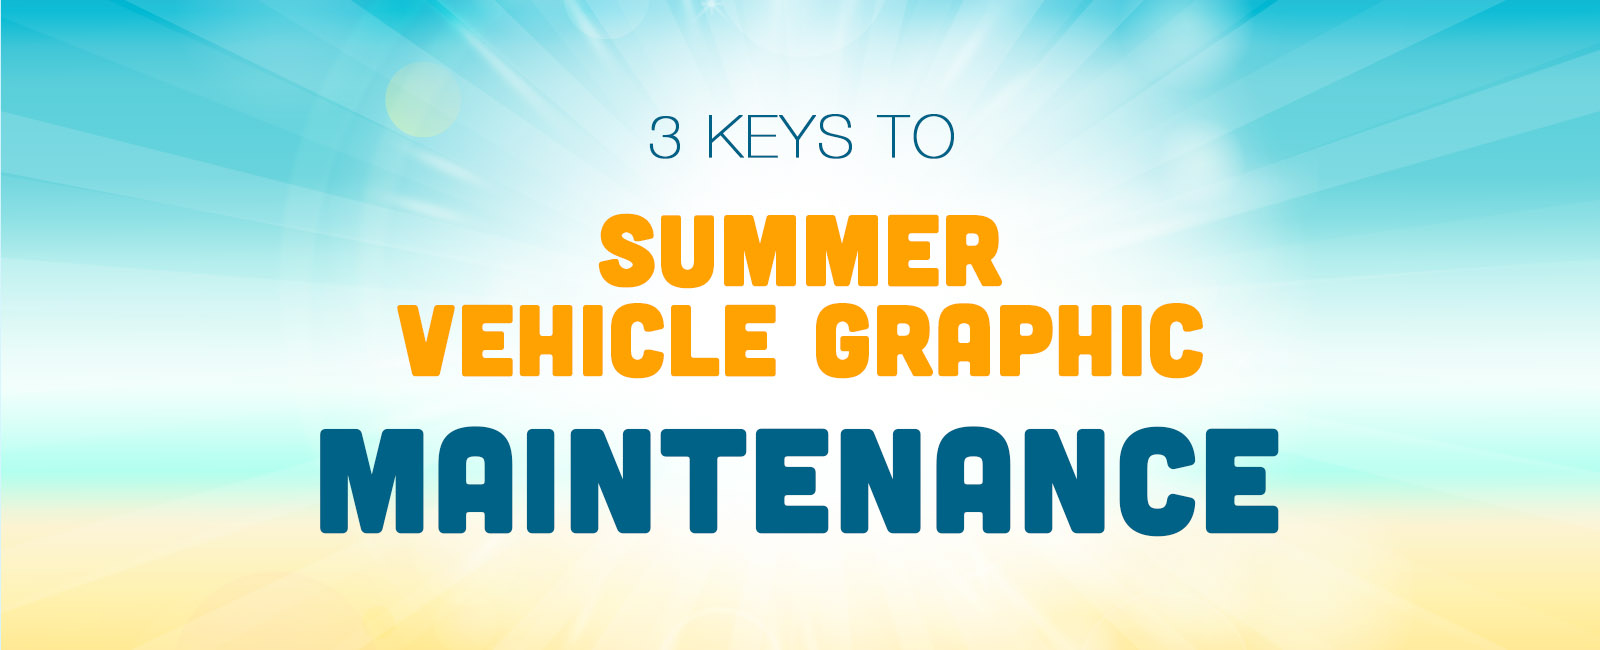 Summer Vehicle Graphic Maintenance